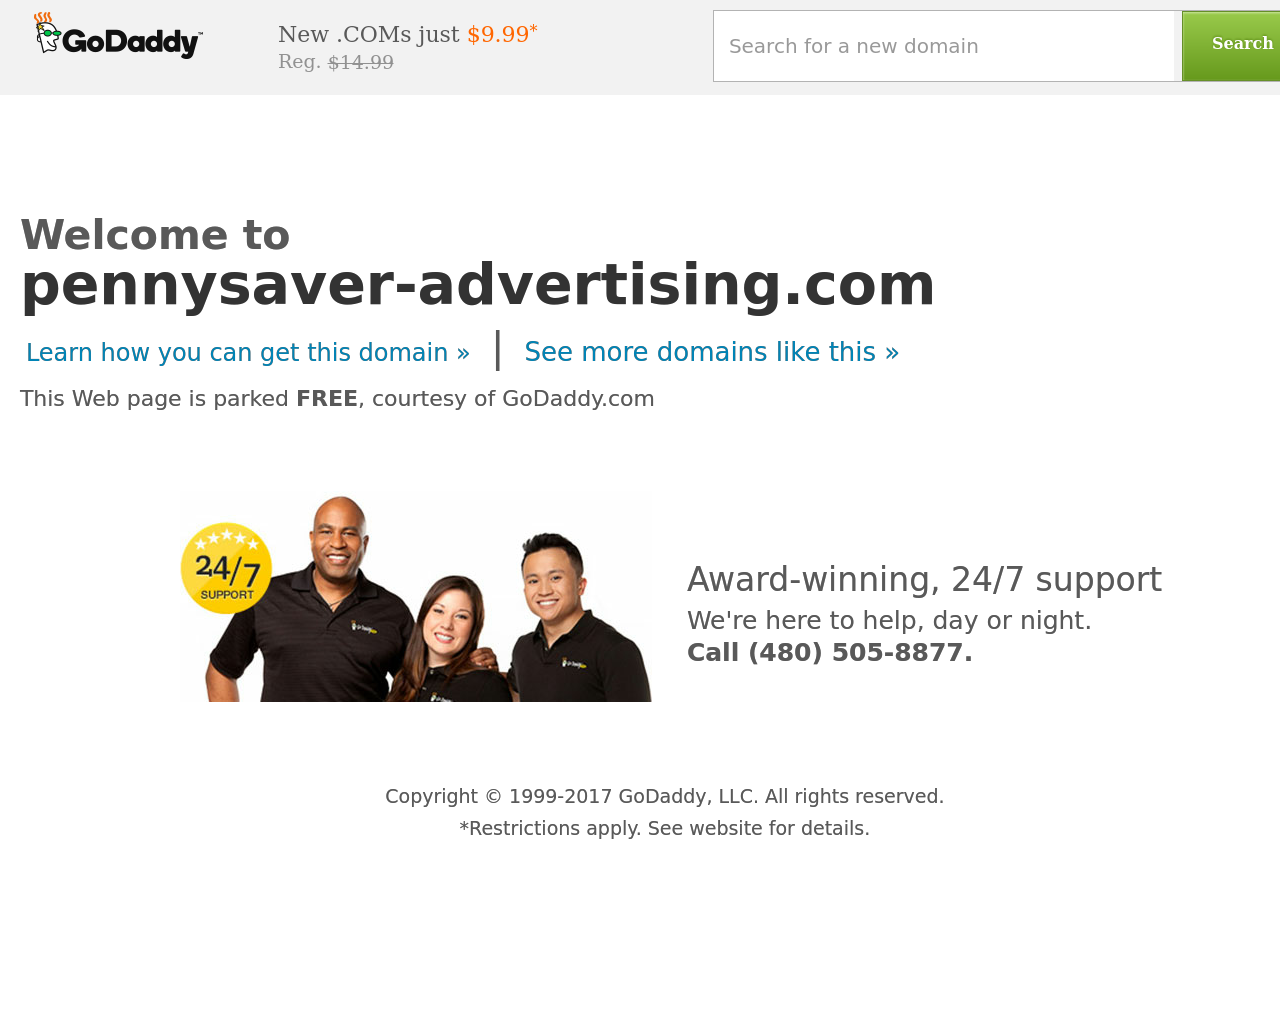 PennySaver--Advertising.com-Advertising-Reviews-Pricing